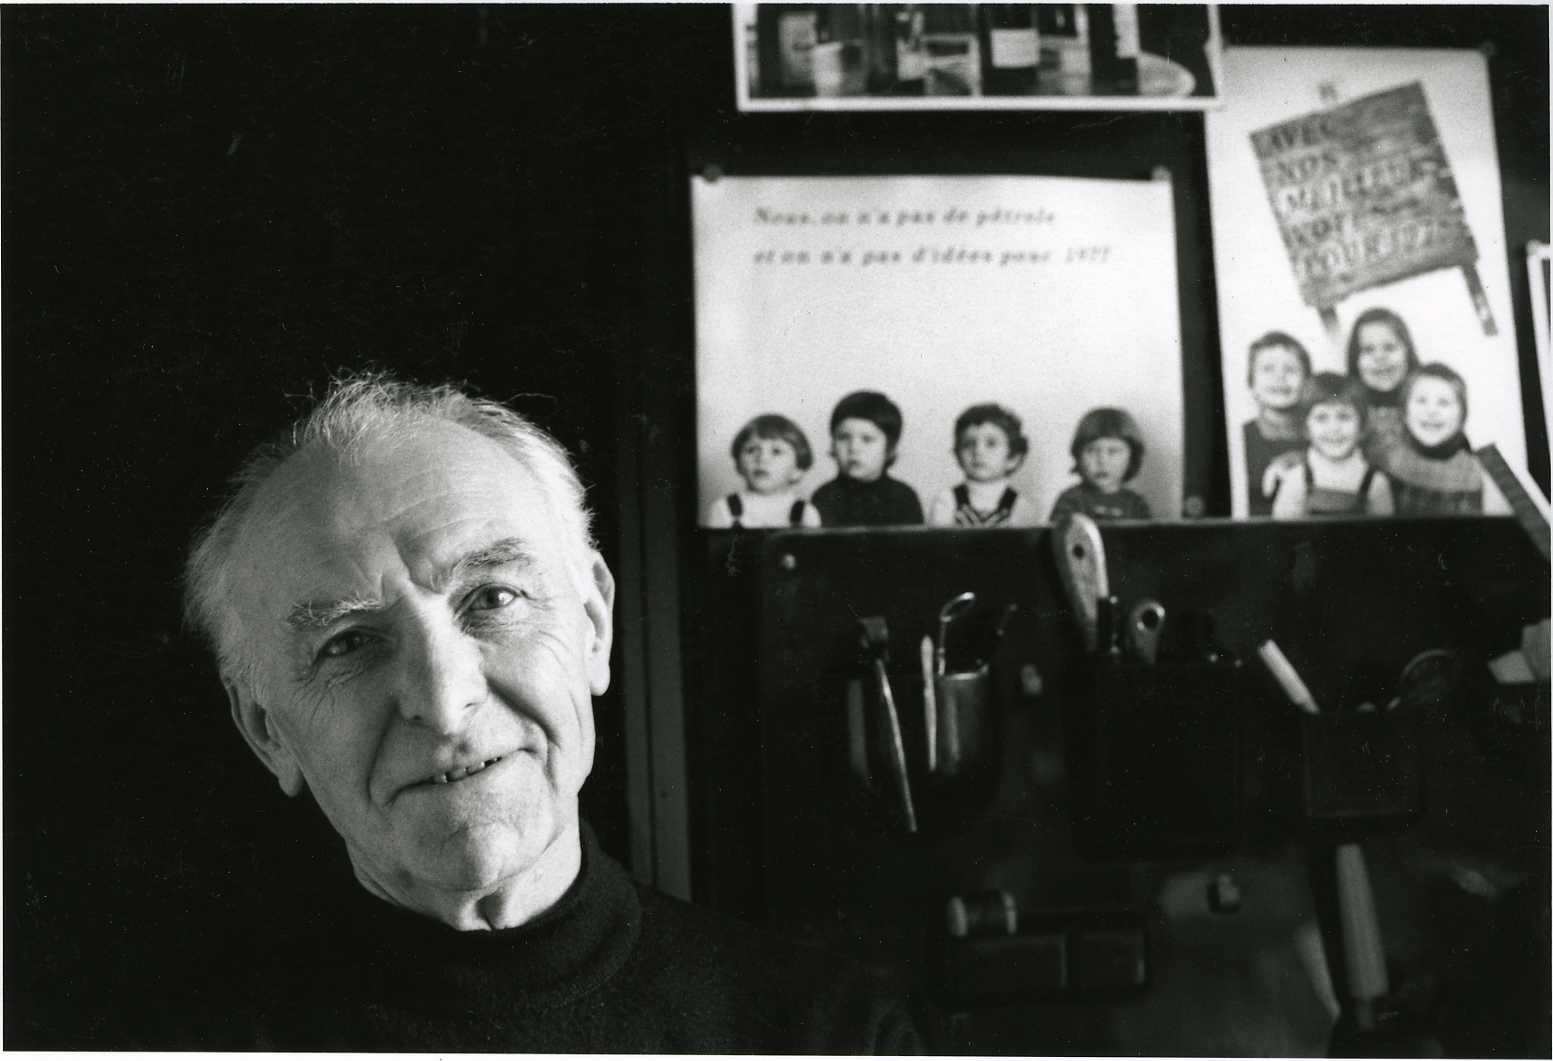 Robert Doisneau by Bracha L. Ettinger 1992